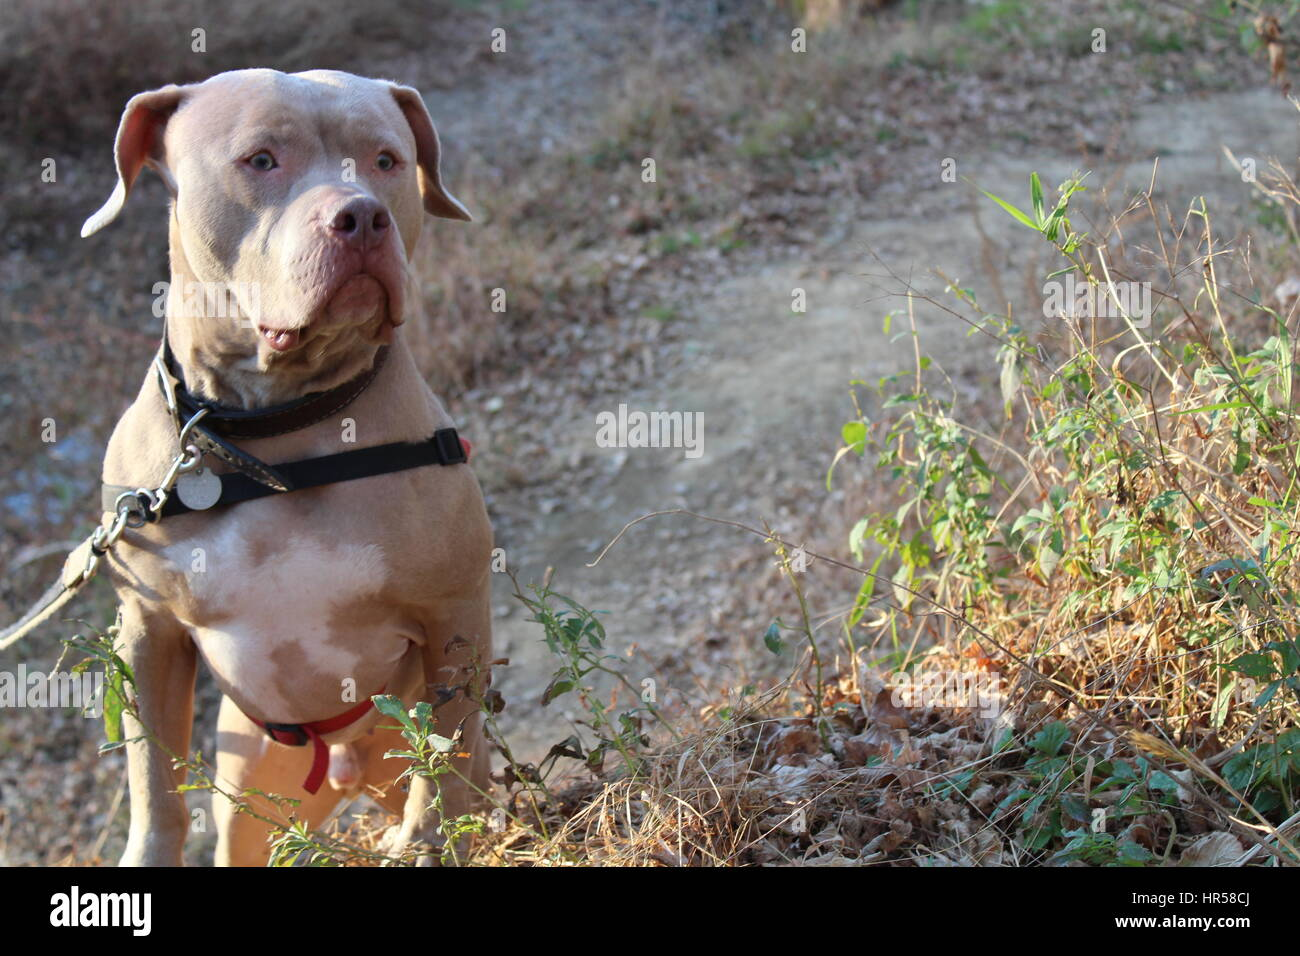 American Staffordshire Terrier. Pitbull - Stock Image